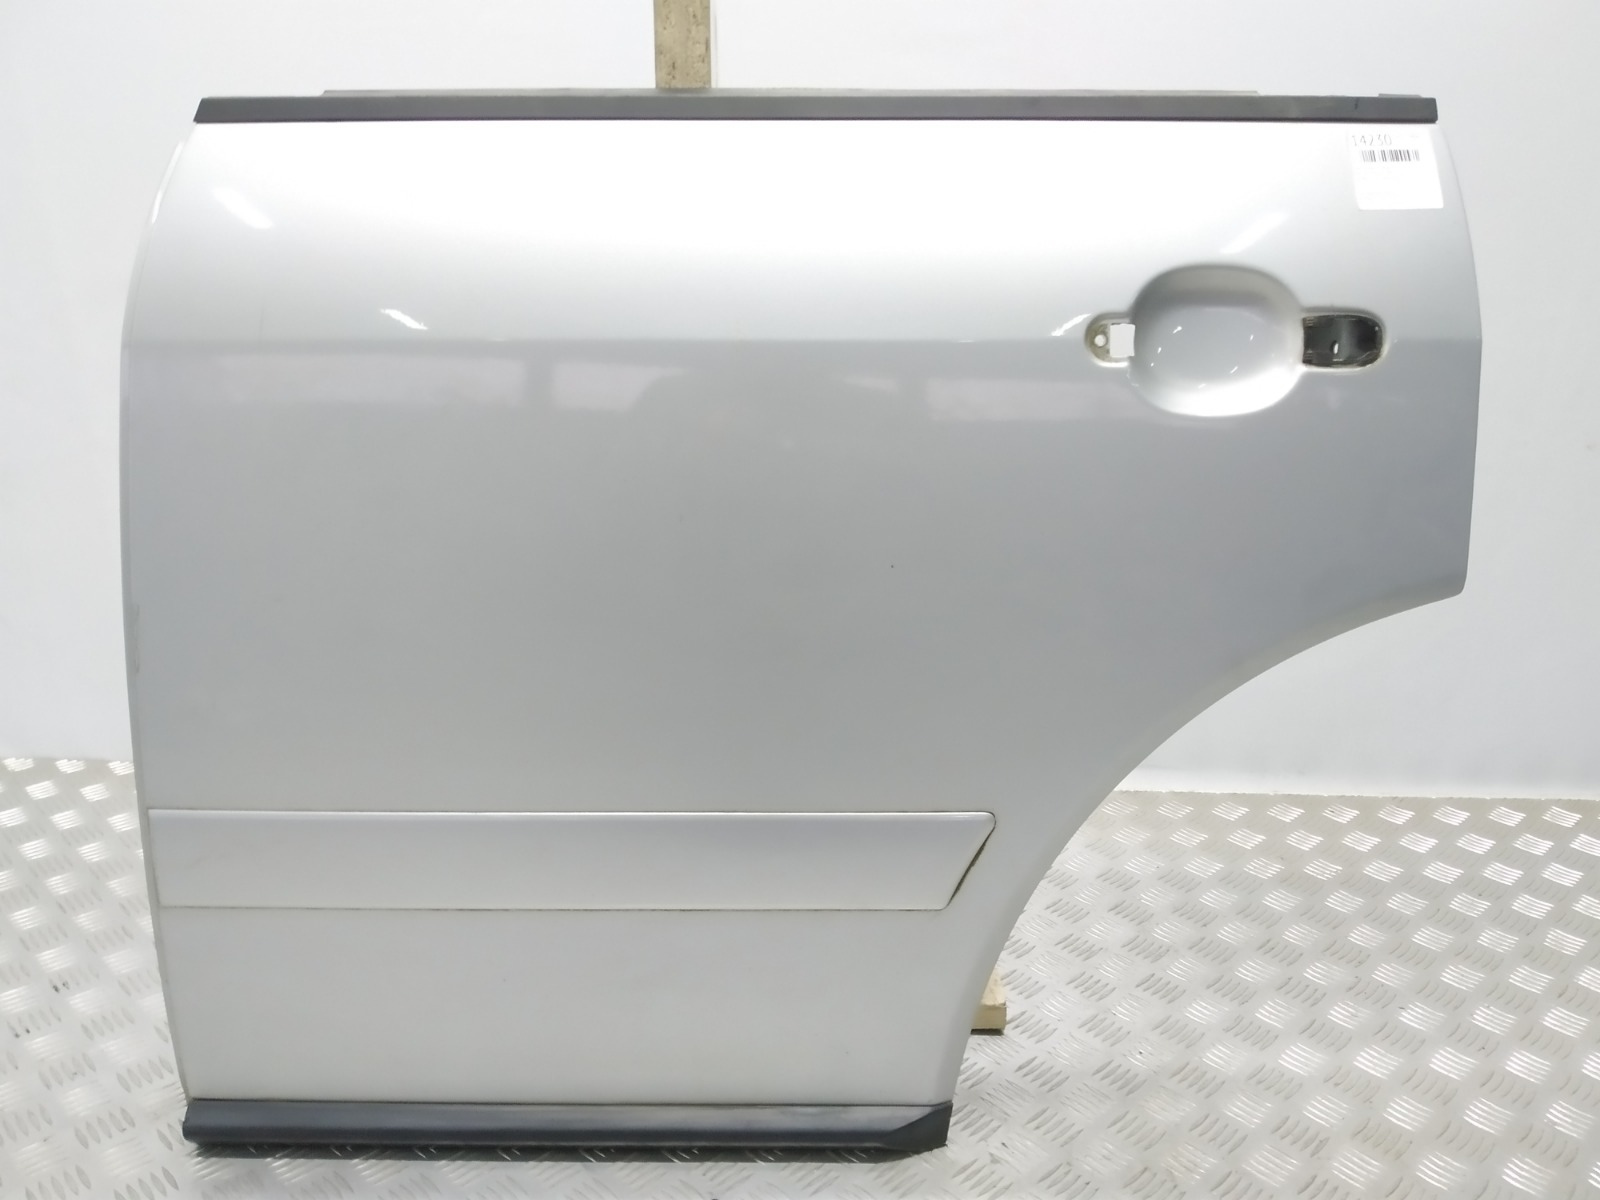 Дверь задняя левая Audi A2 8Z 1.4 I 2000 (б/у)